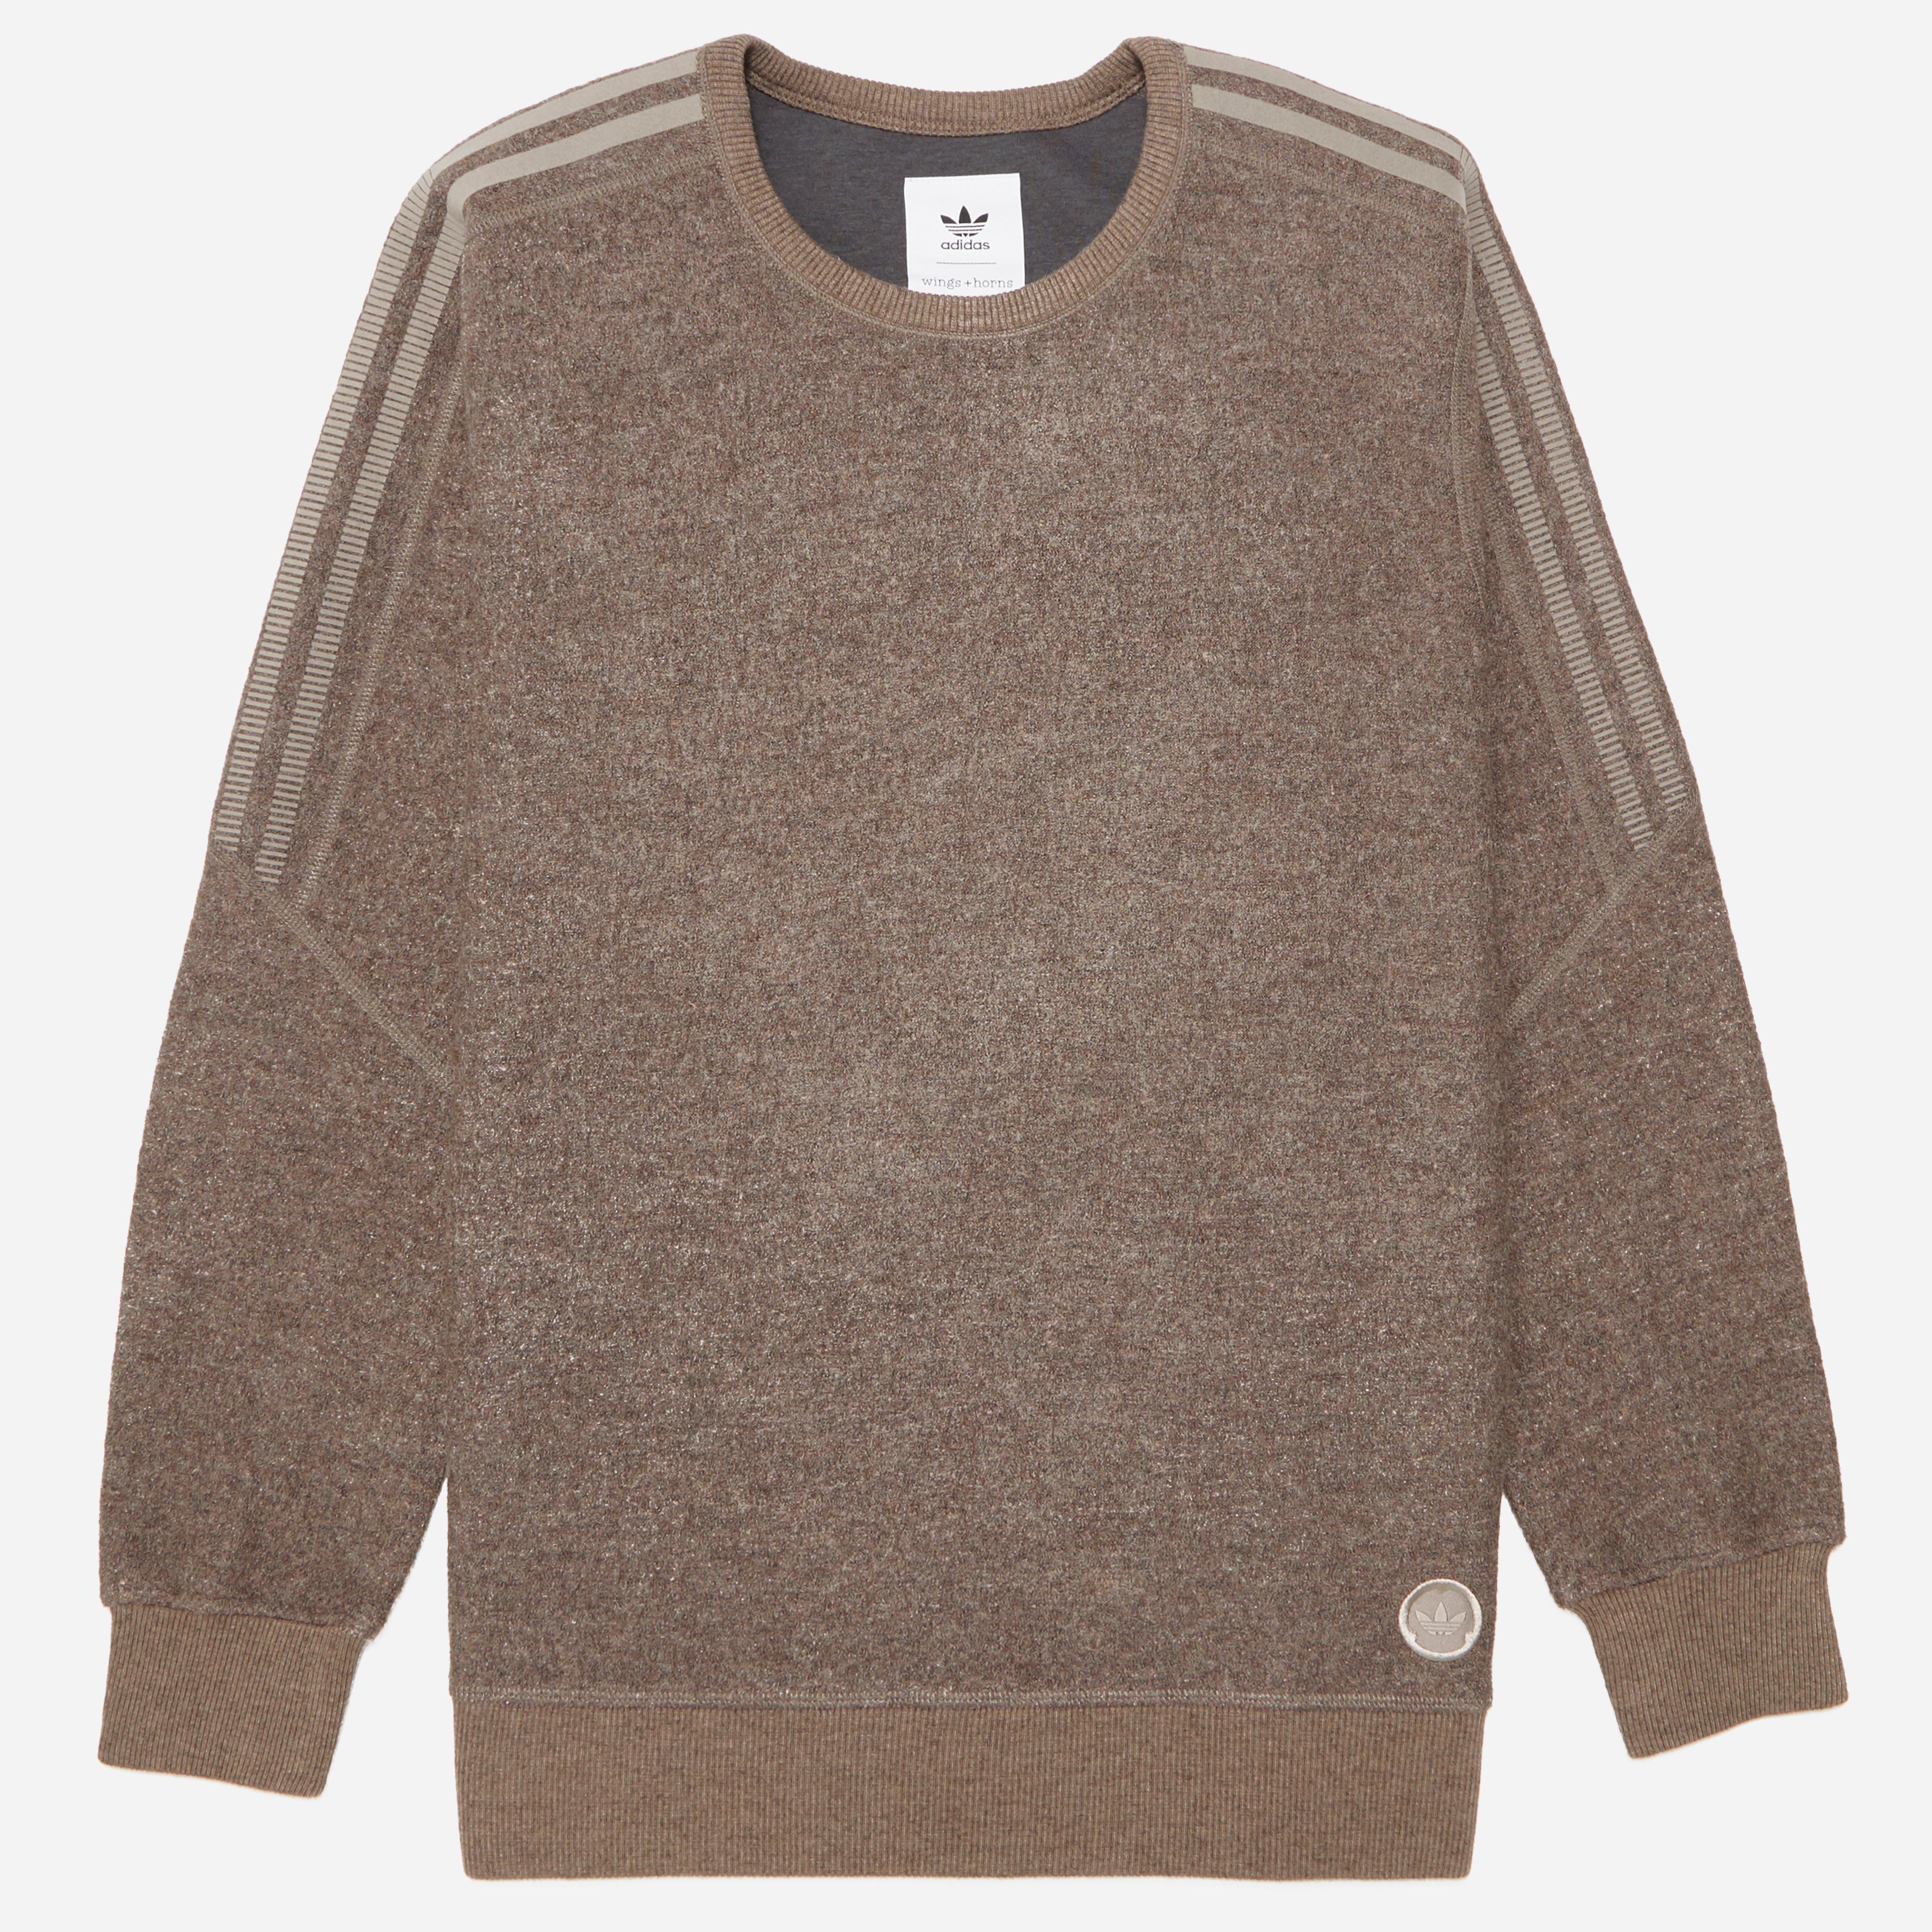 adidas Originals X Wings + Horns Bond Wool Crew Sweatshirts